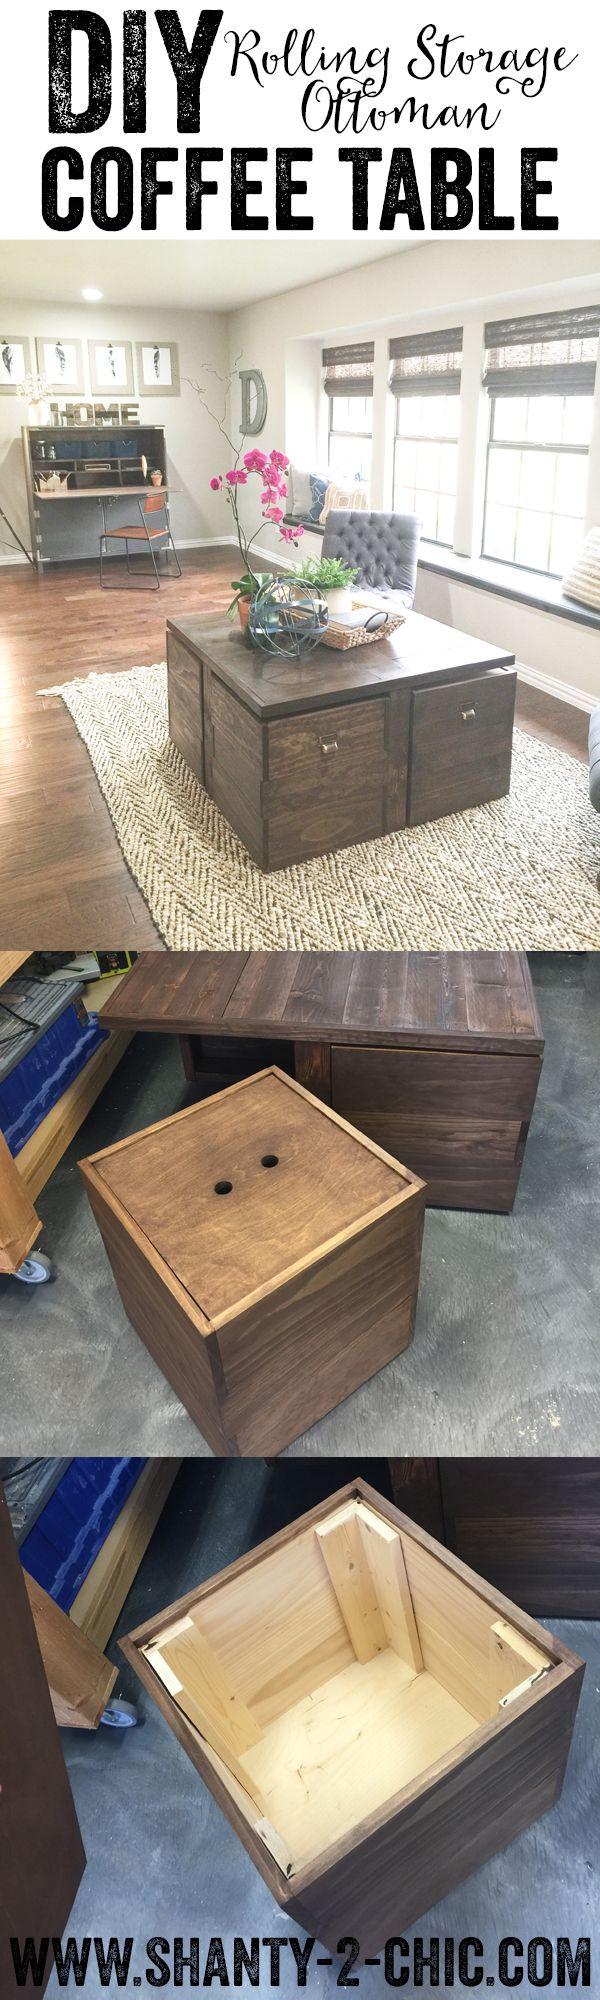 DIY Rolling Storage Ottoman Coffee Table